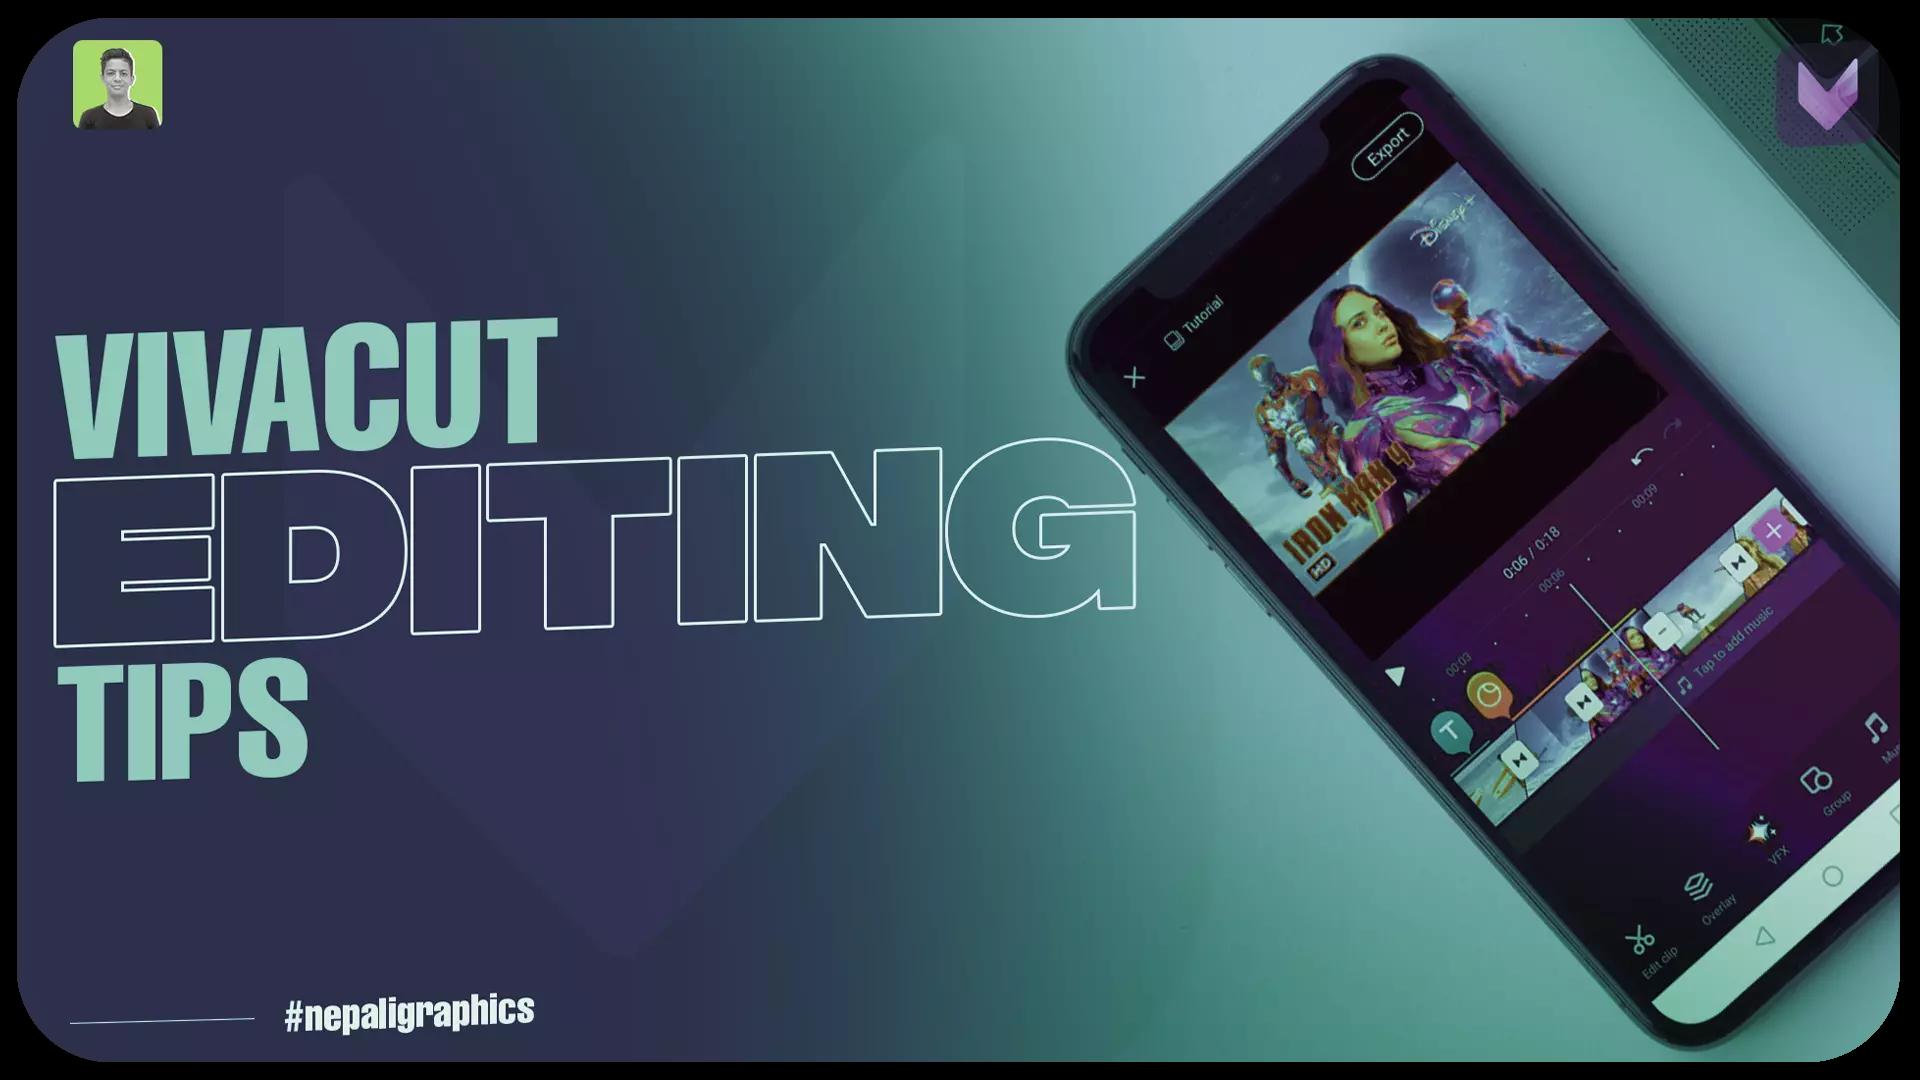 viva-cut-video-editing-app